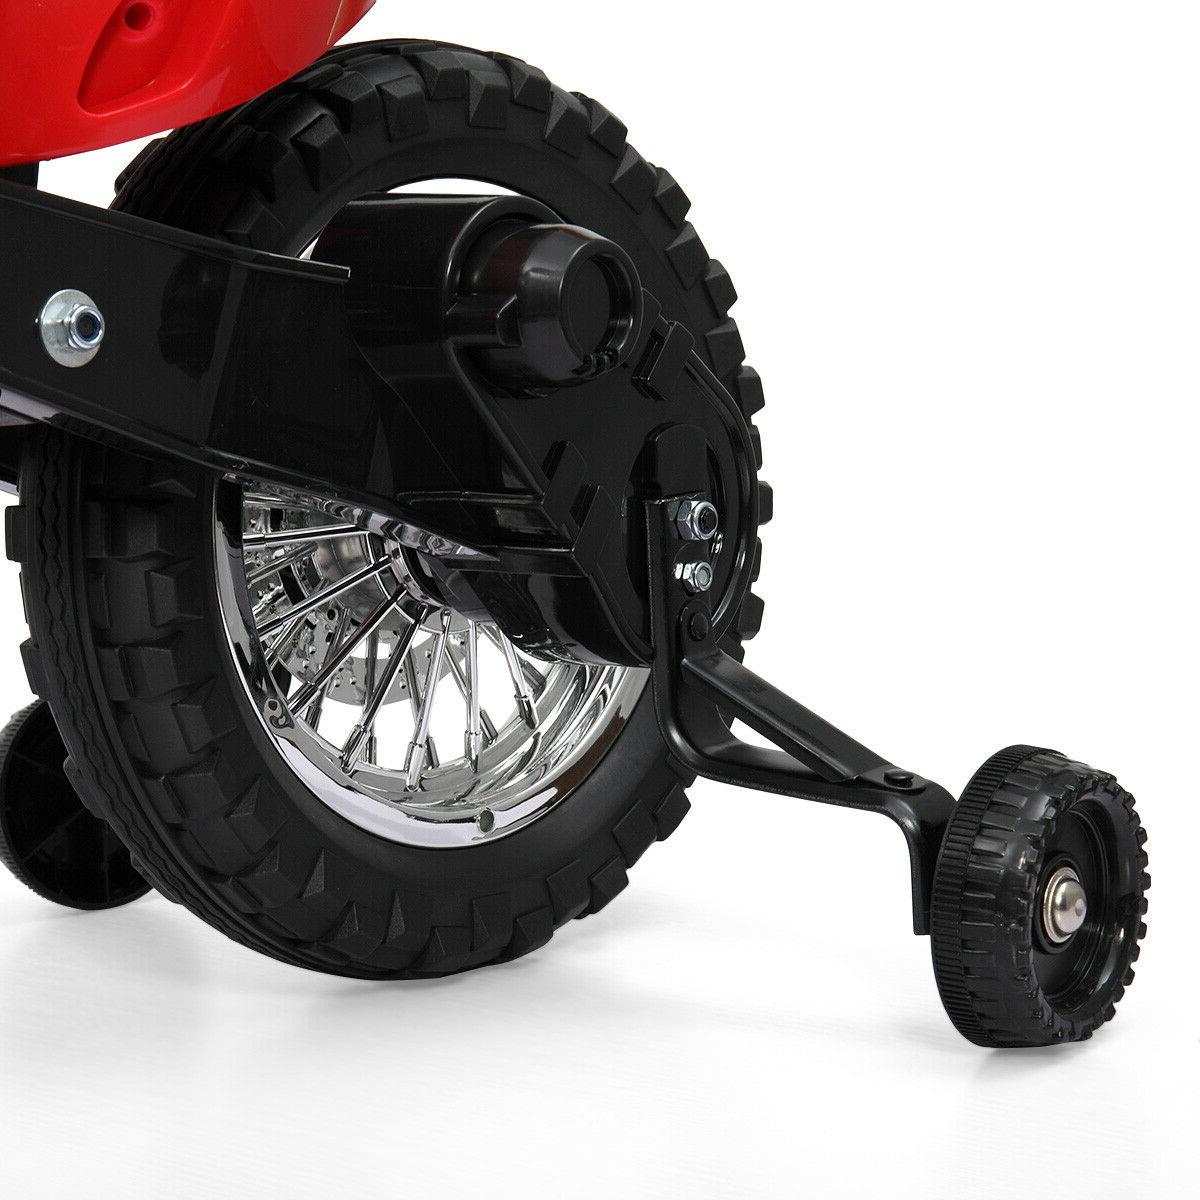 6V On Motorcycle w/ Training New